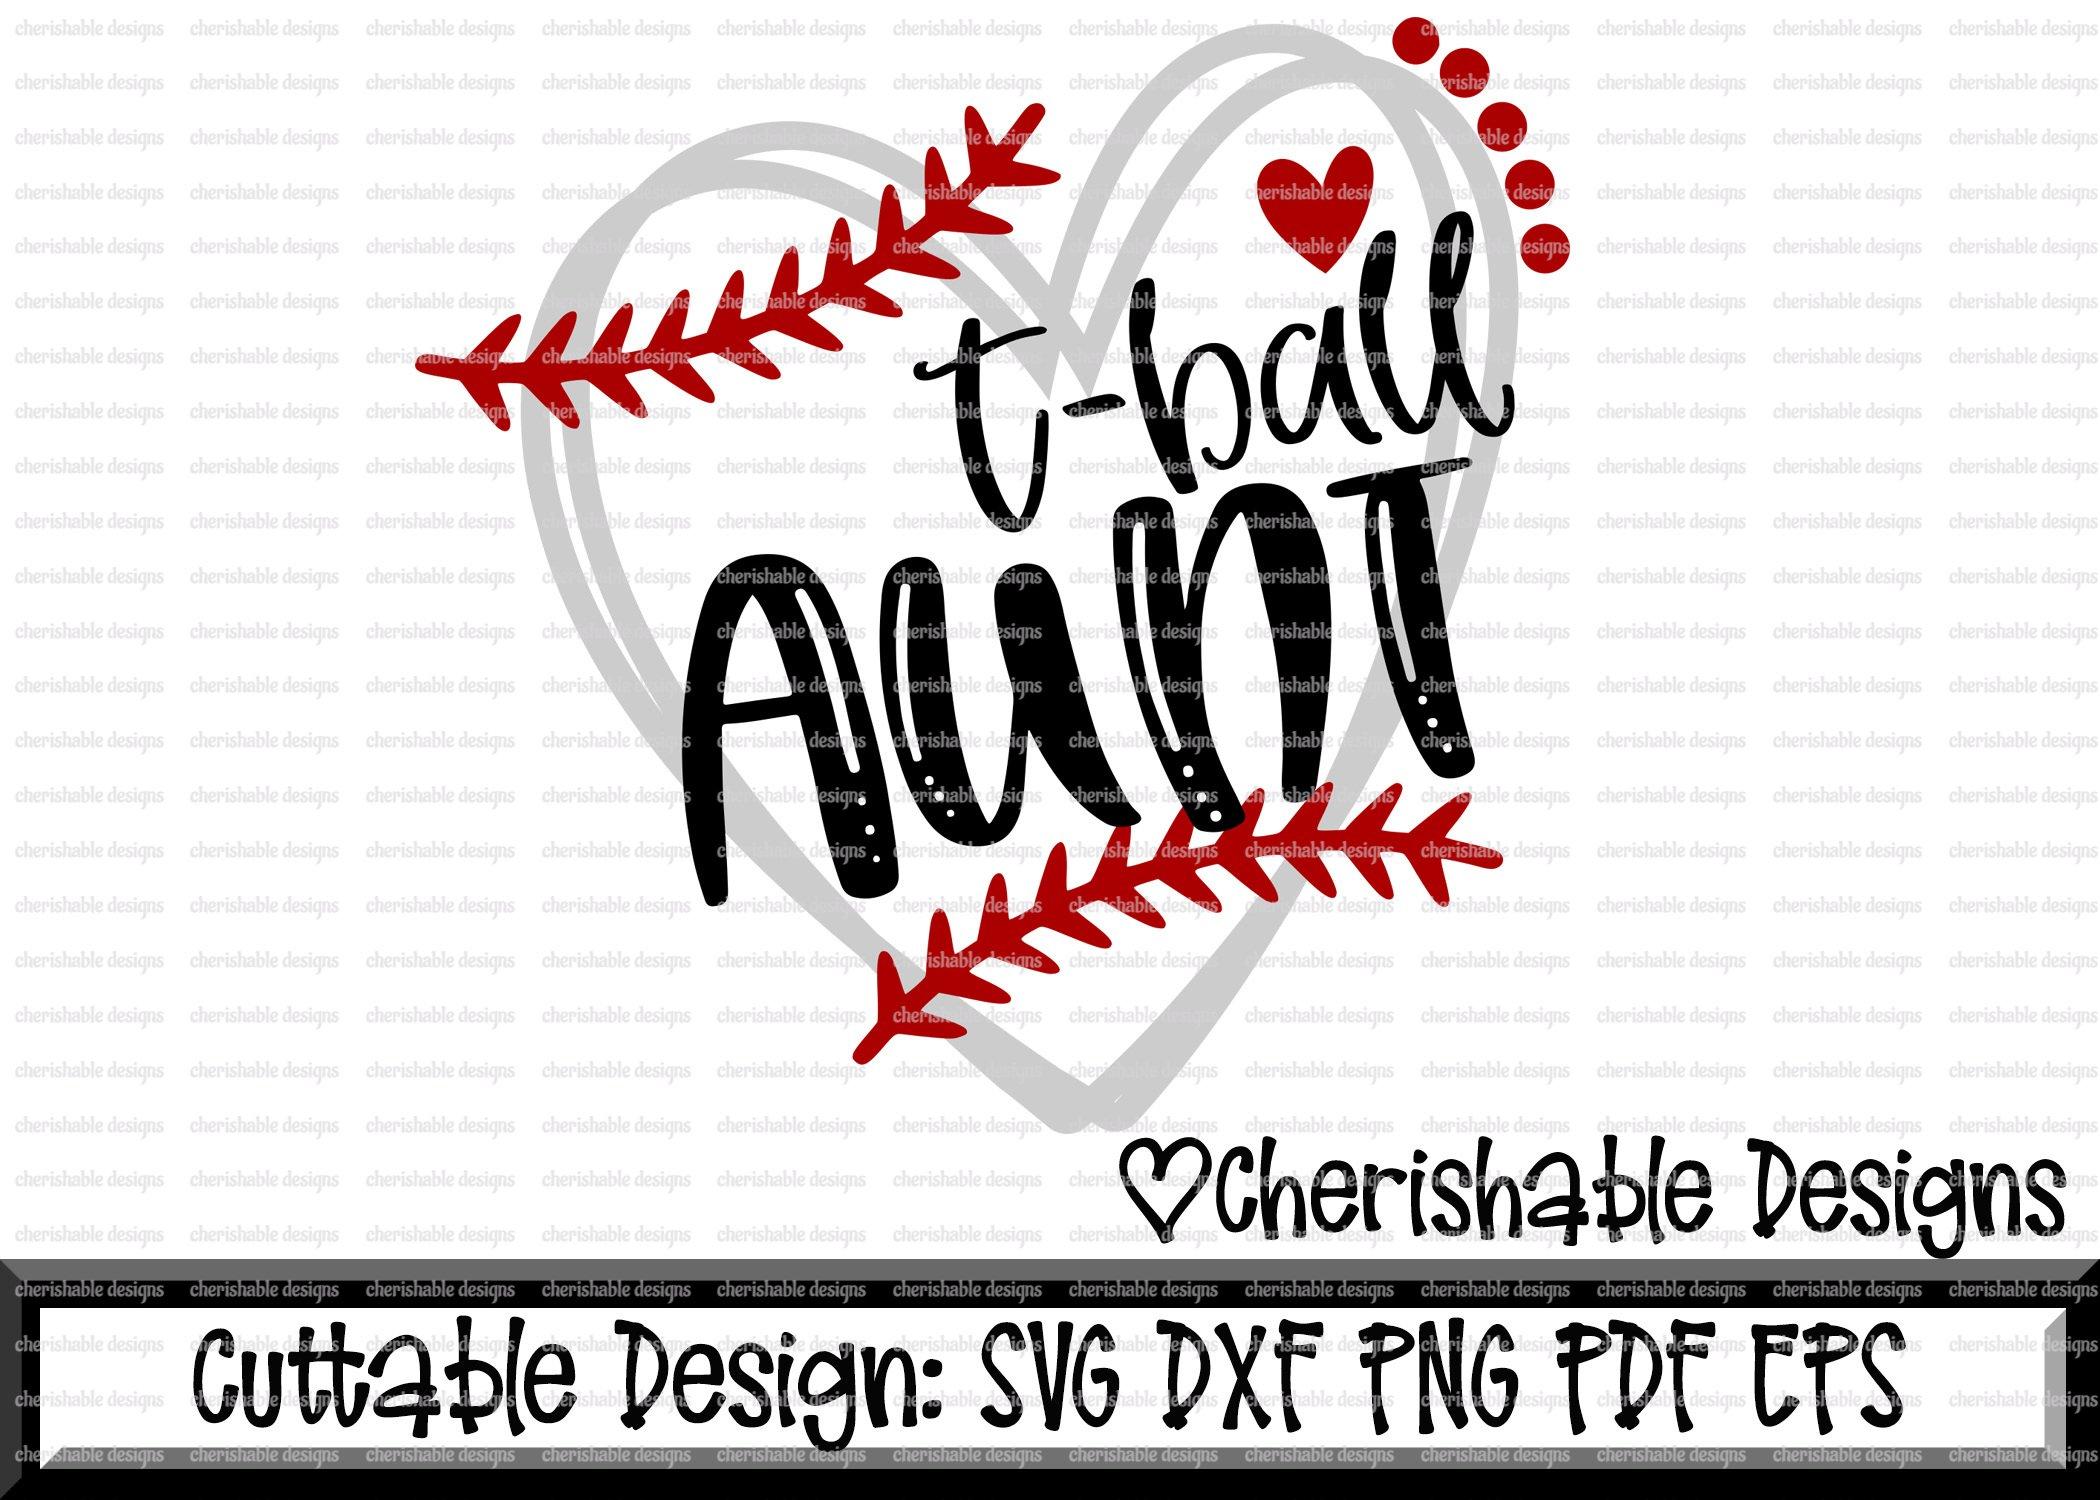 T Ball Svg T Ball Aunt Svg T Ball Cutting File T Ball Svg 101359 Svgs Design Bundles